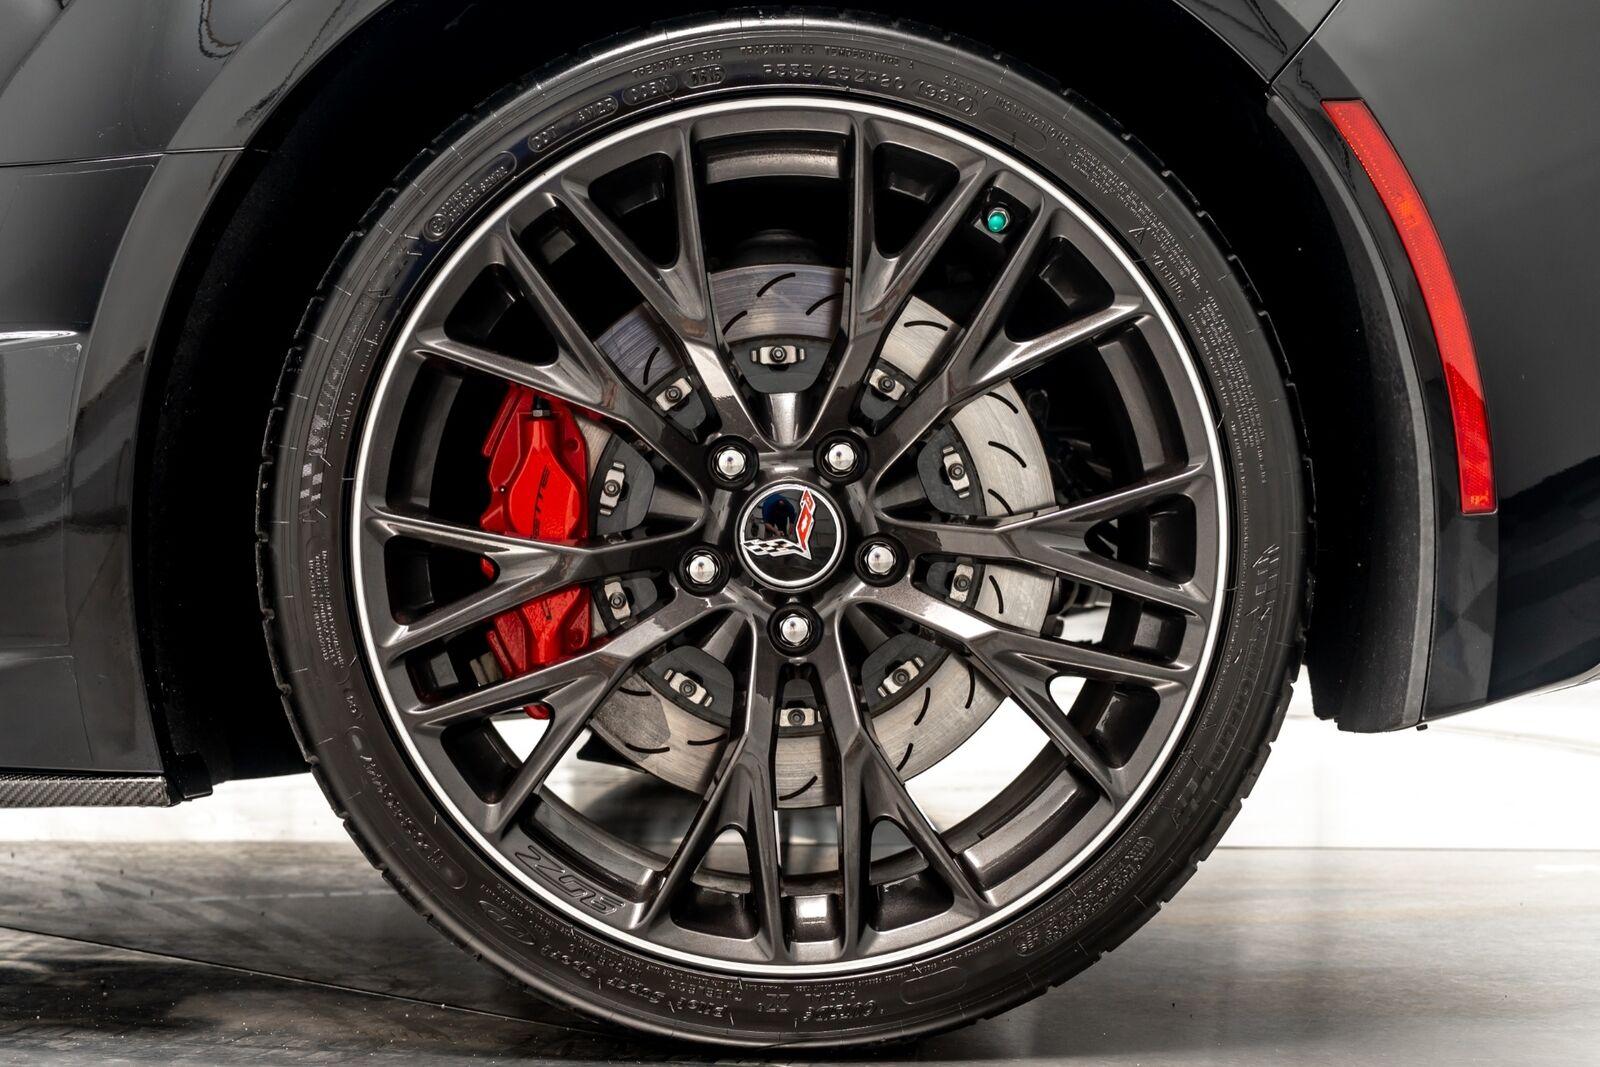 2015 Black Chevrolet Corvette Z06 3LZ   C7 Corvette Photo 10